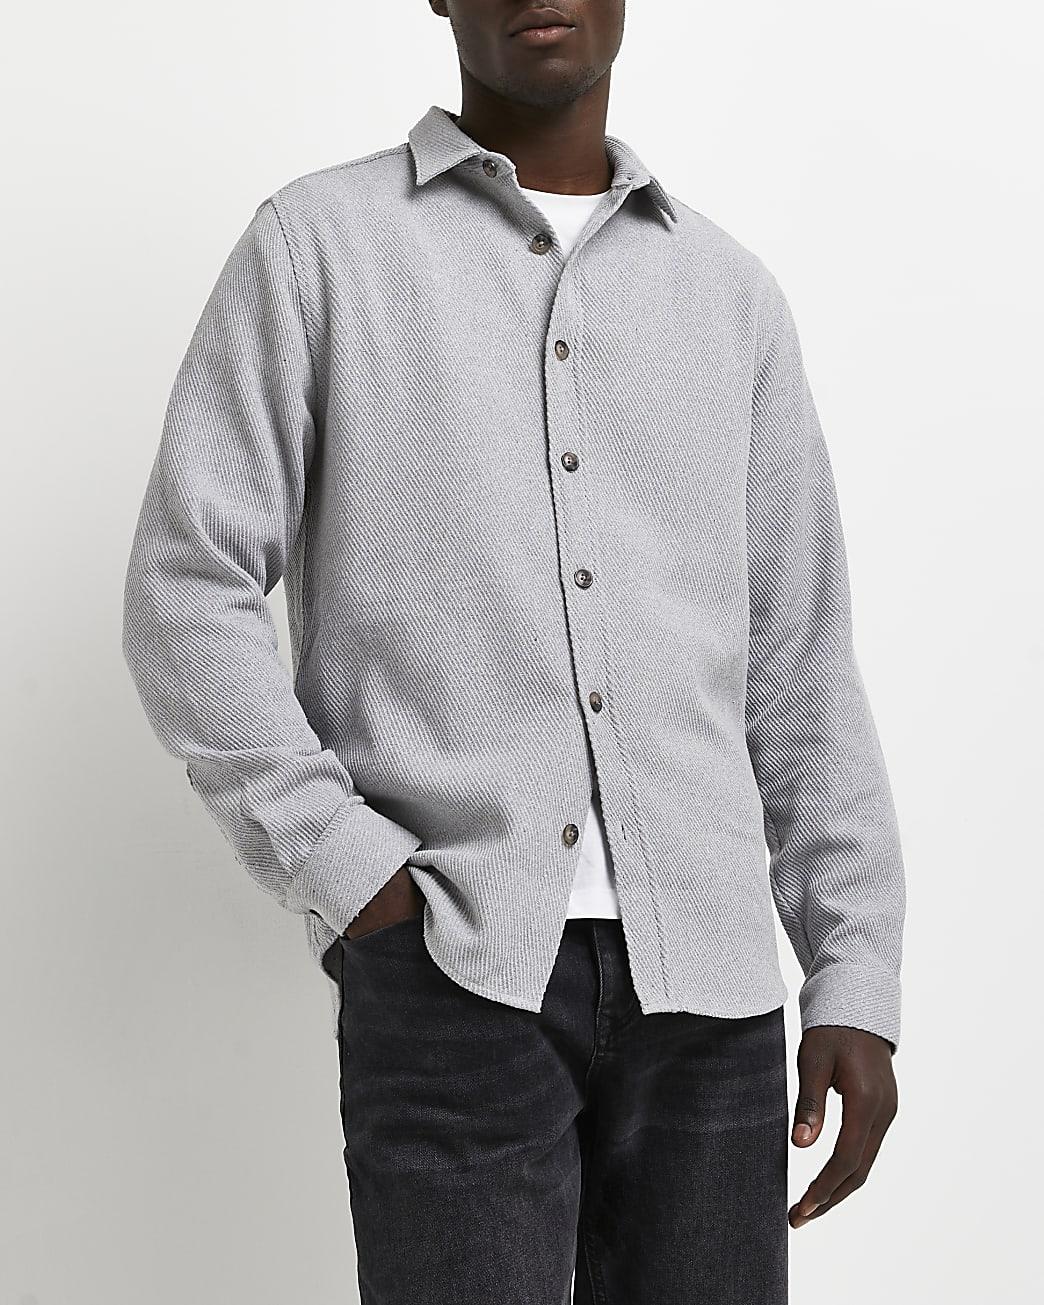 Grey twill regular fit long sleeve shirt